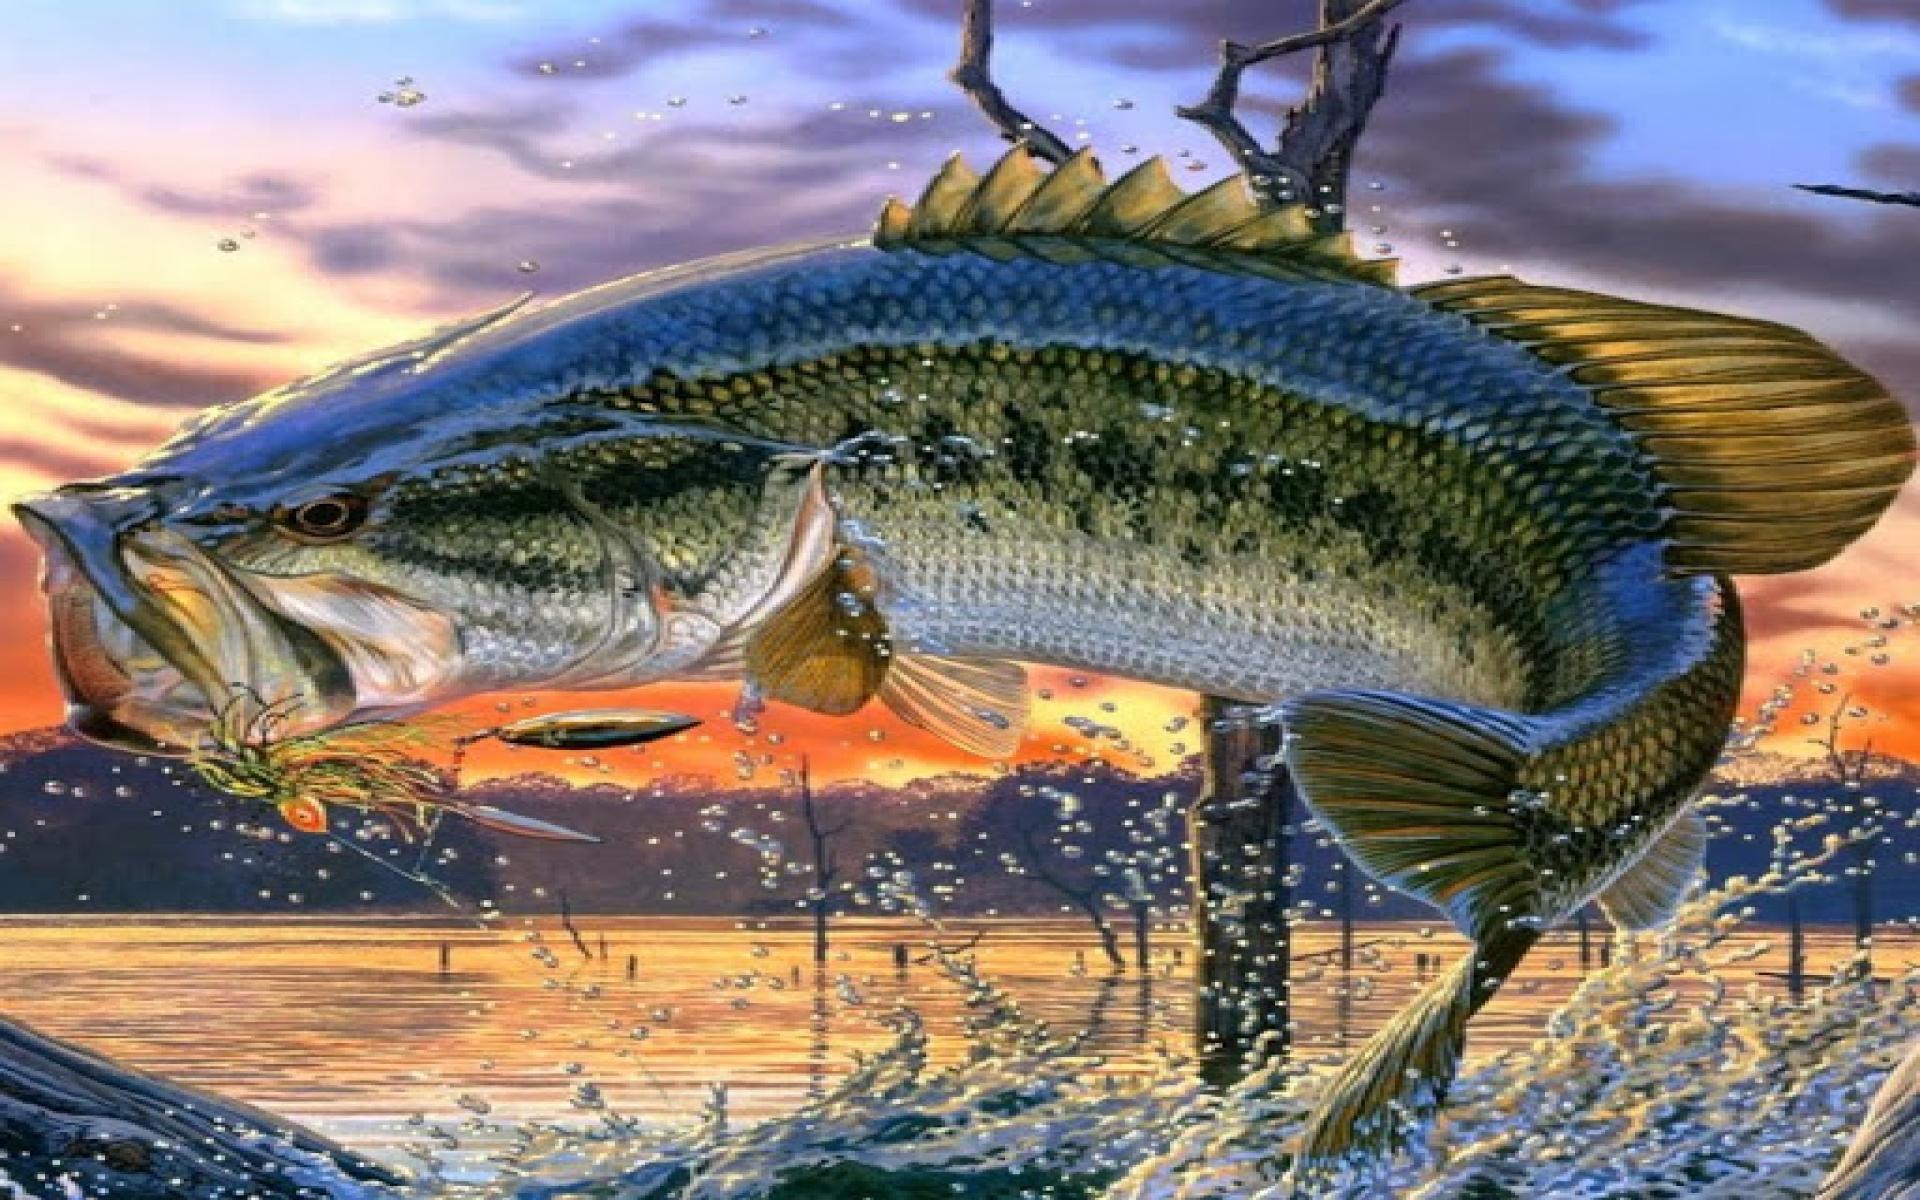 Largemouth Bass Fishing Wallpaper T4hg9sj Bass Fishing Screen Saver 460612 Hd Wallpaper Backgrounds Download